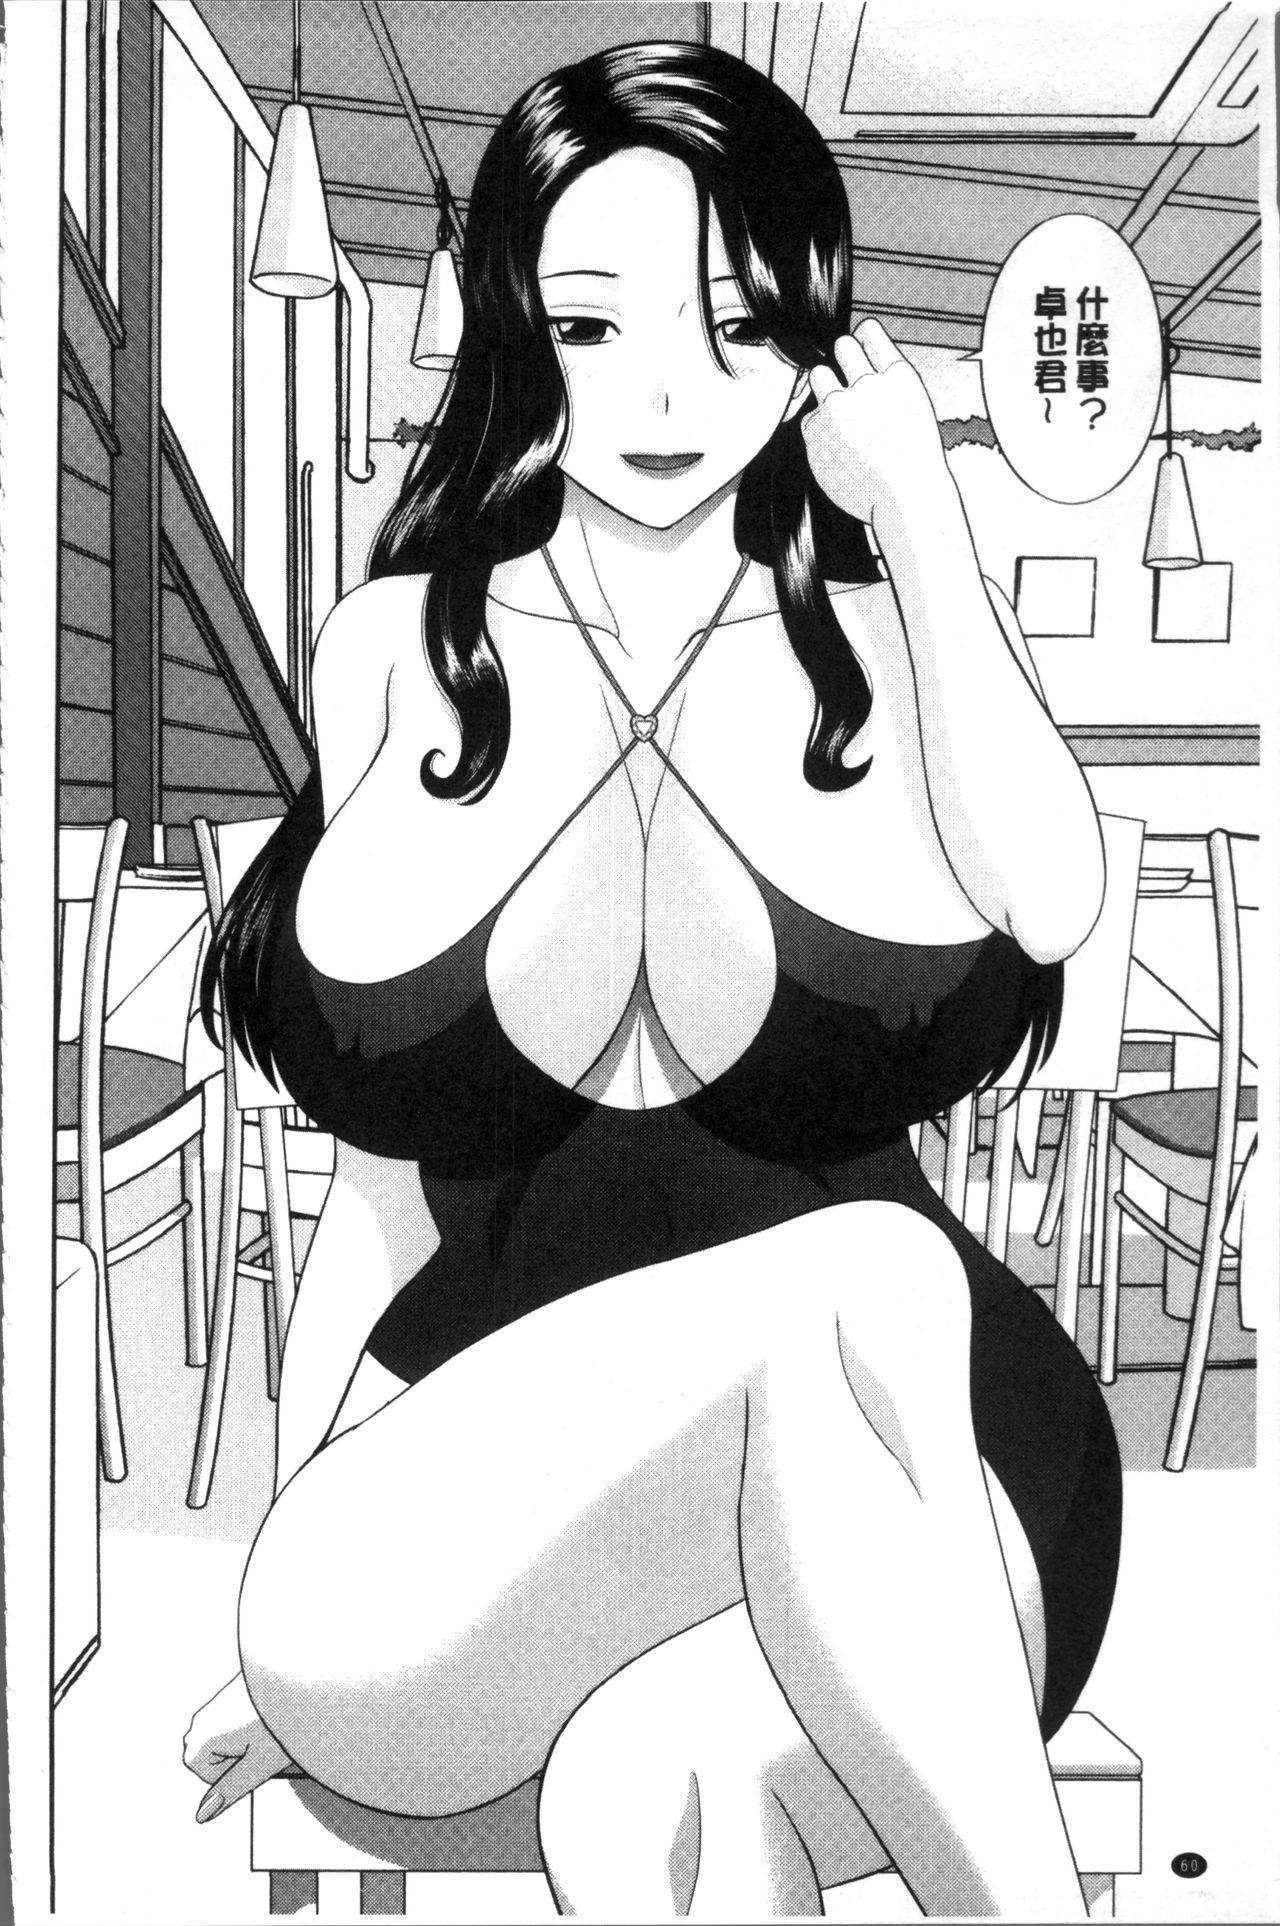 [Kawamori Misaki] Innyuu Shufu no Futei Ganbou - Oku-san to Kanojo to 2 | 淫乳主婦的不貞願望 和人妻也和女友❤2 [Chinese] 63